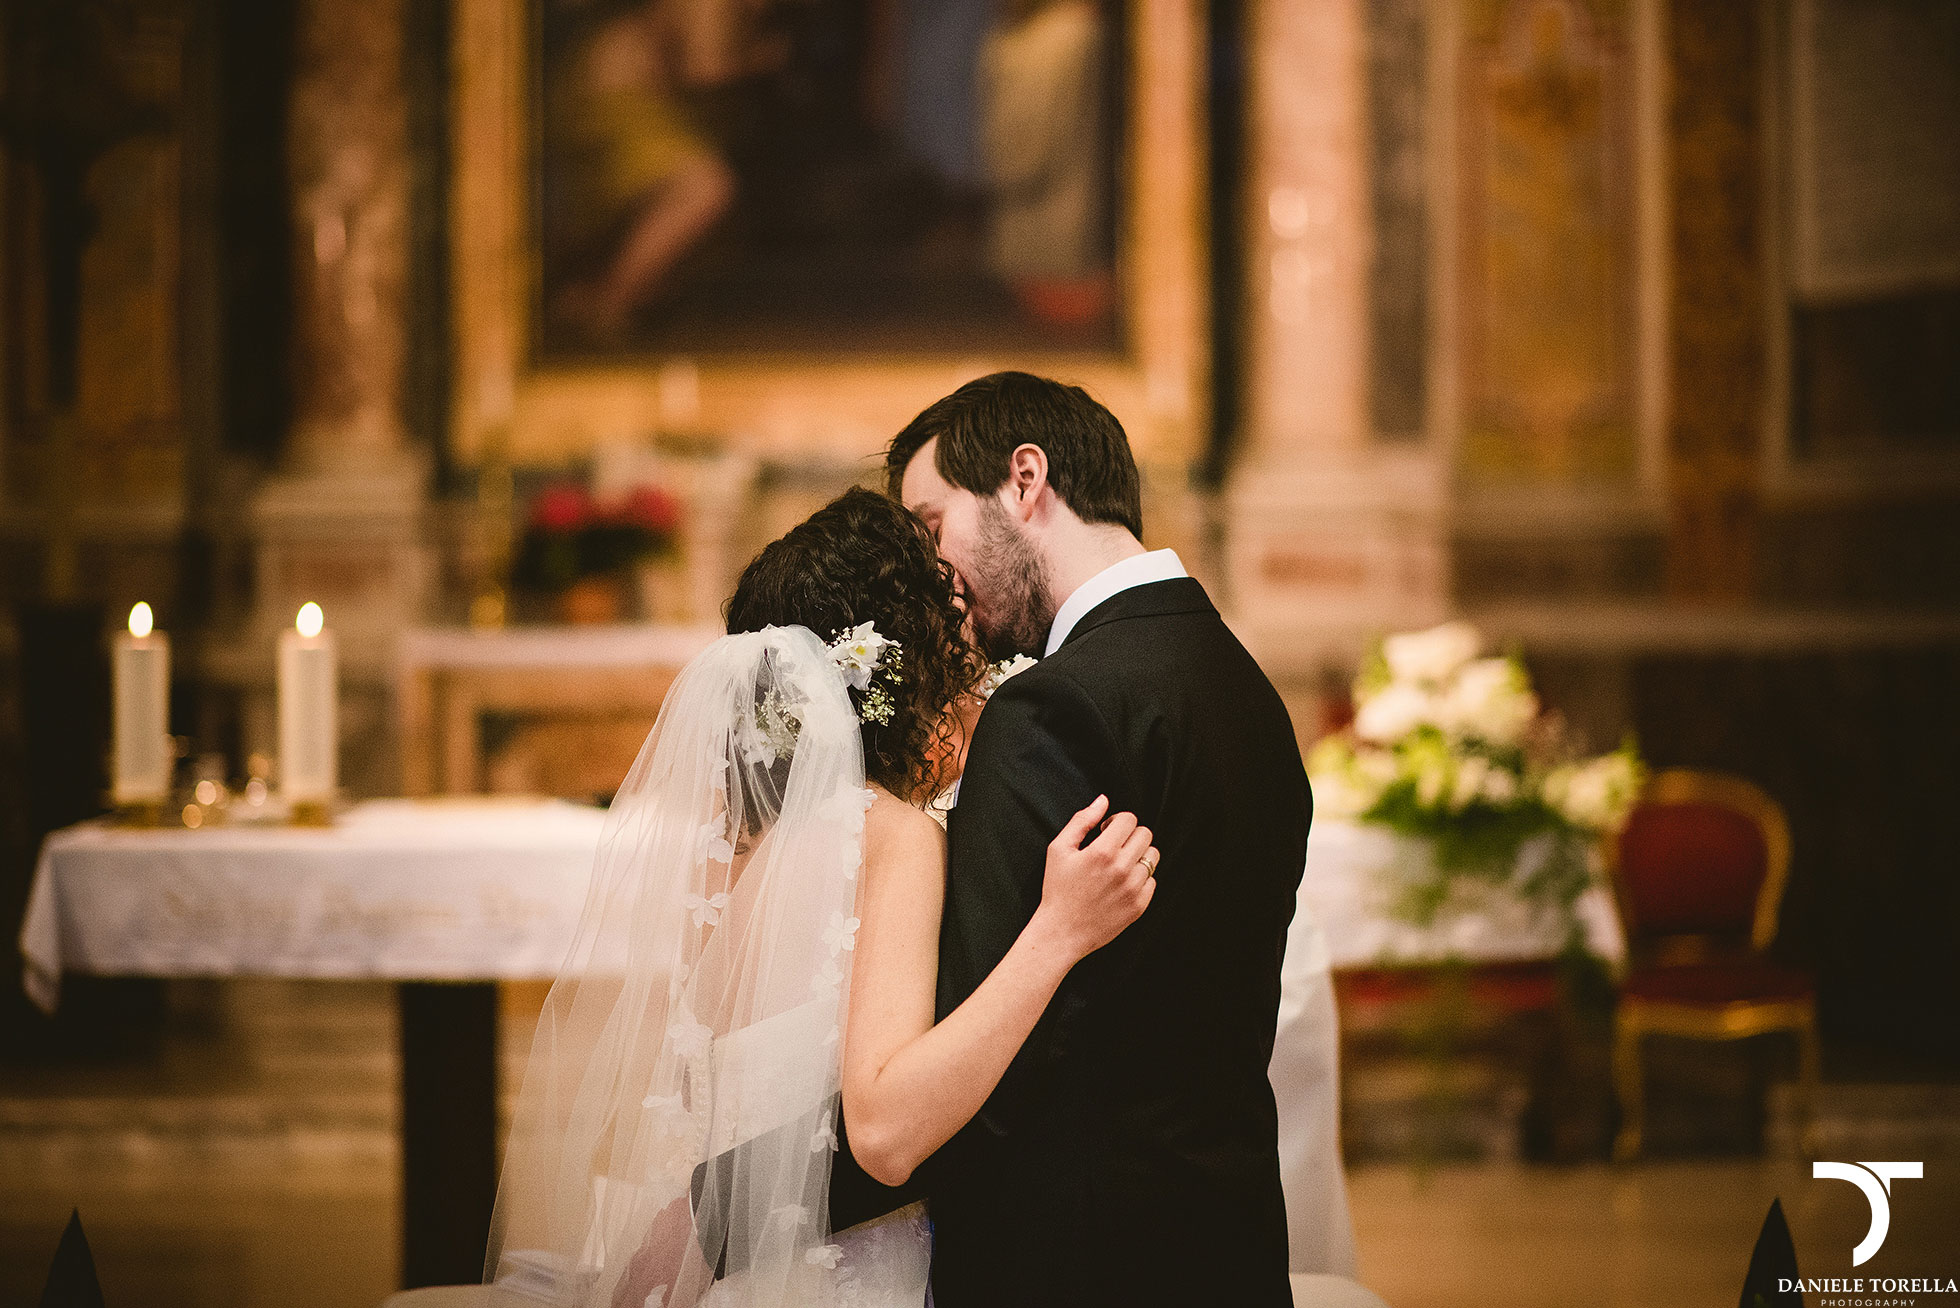 Matrimonio Vigna Toscana : Matrimonio a vigna san sebastiano